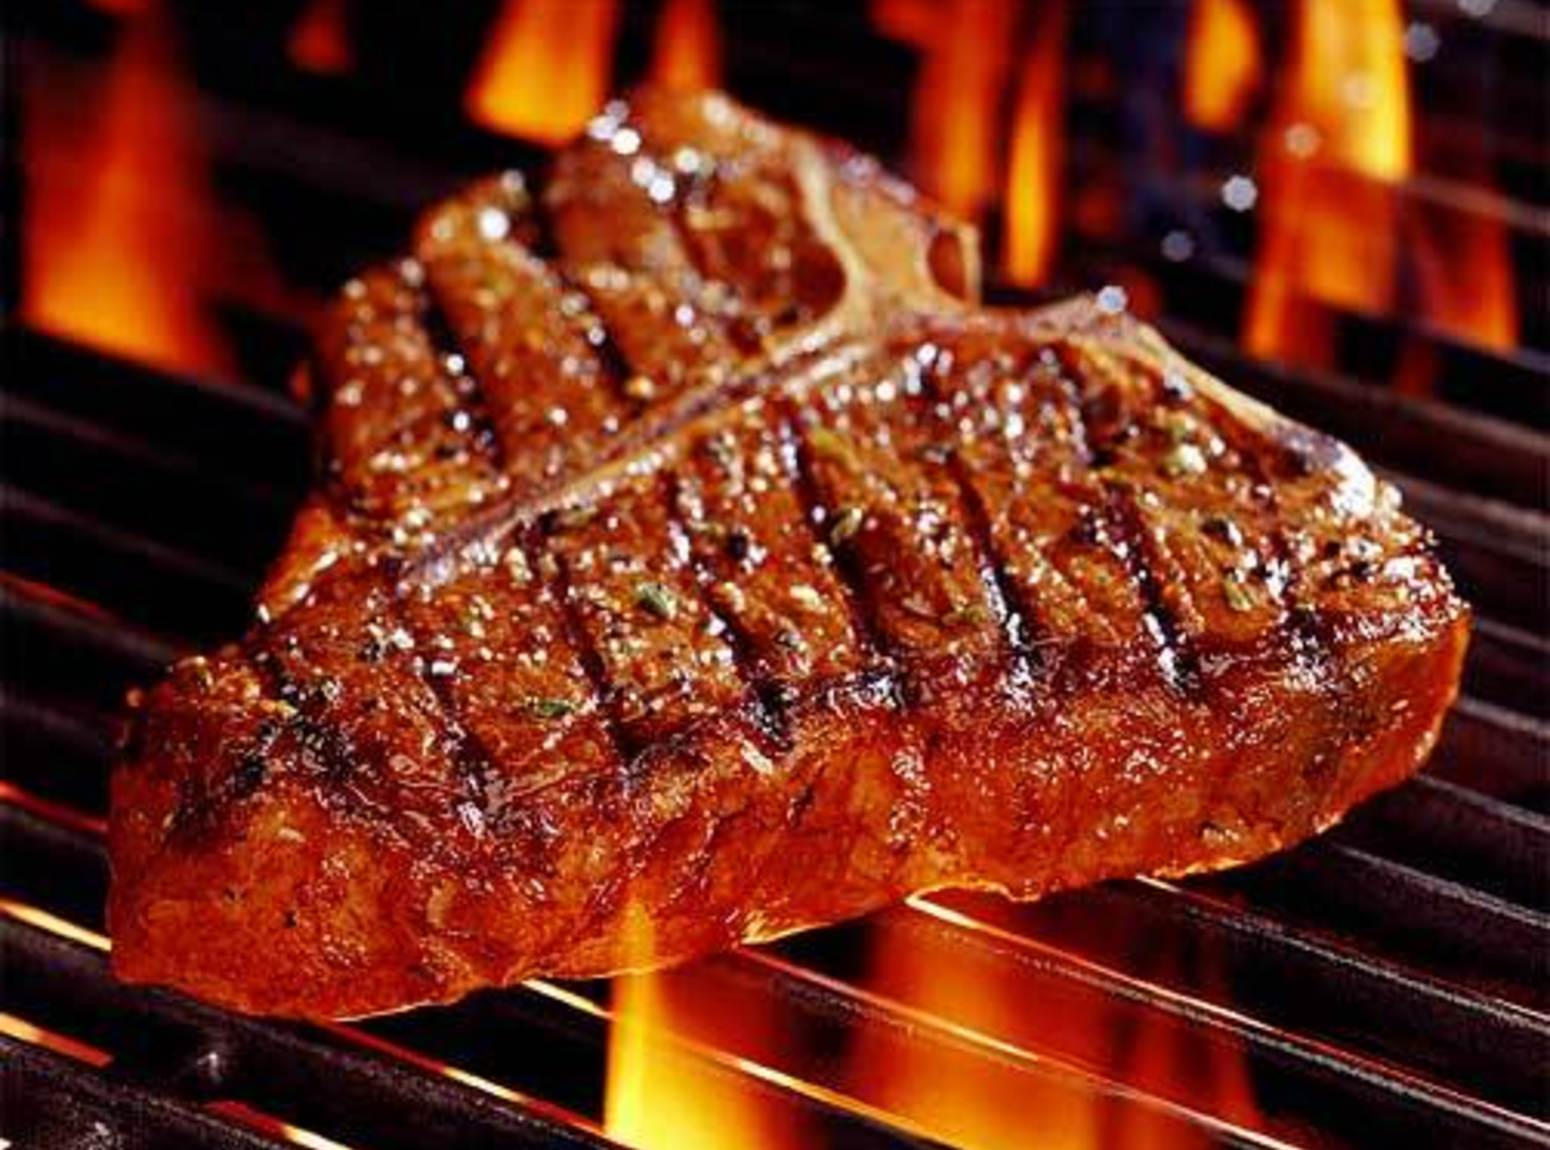 Arrogant Steak Cook Off